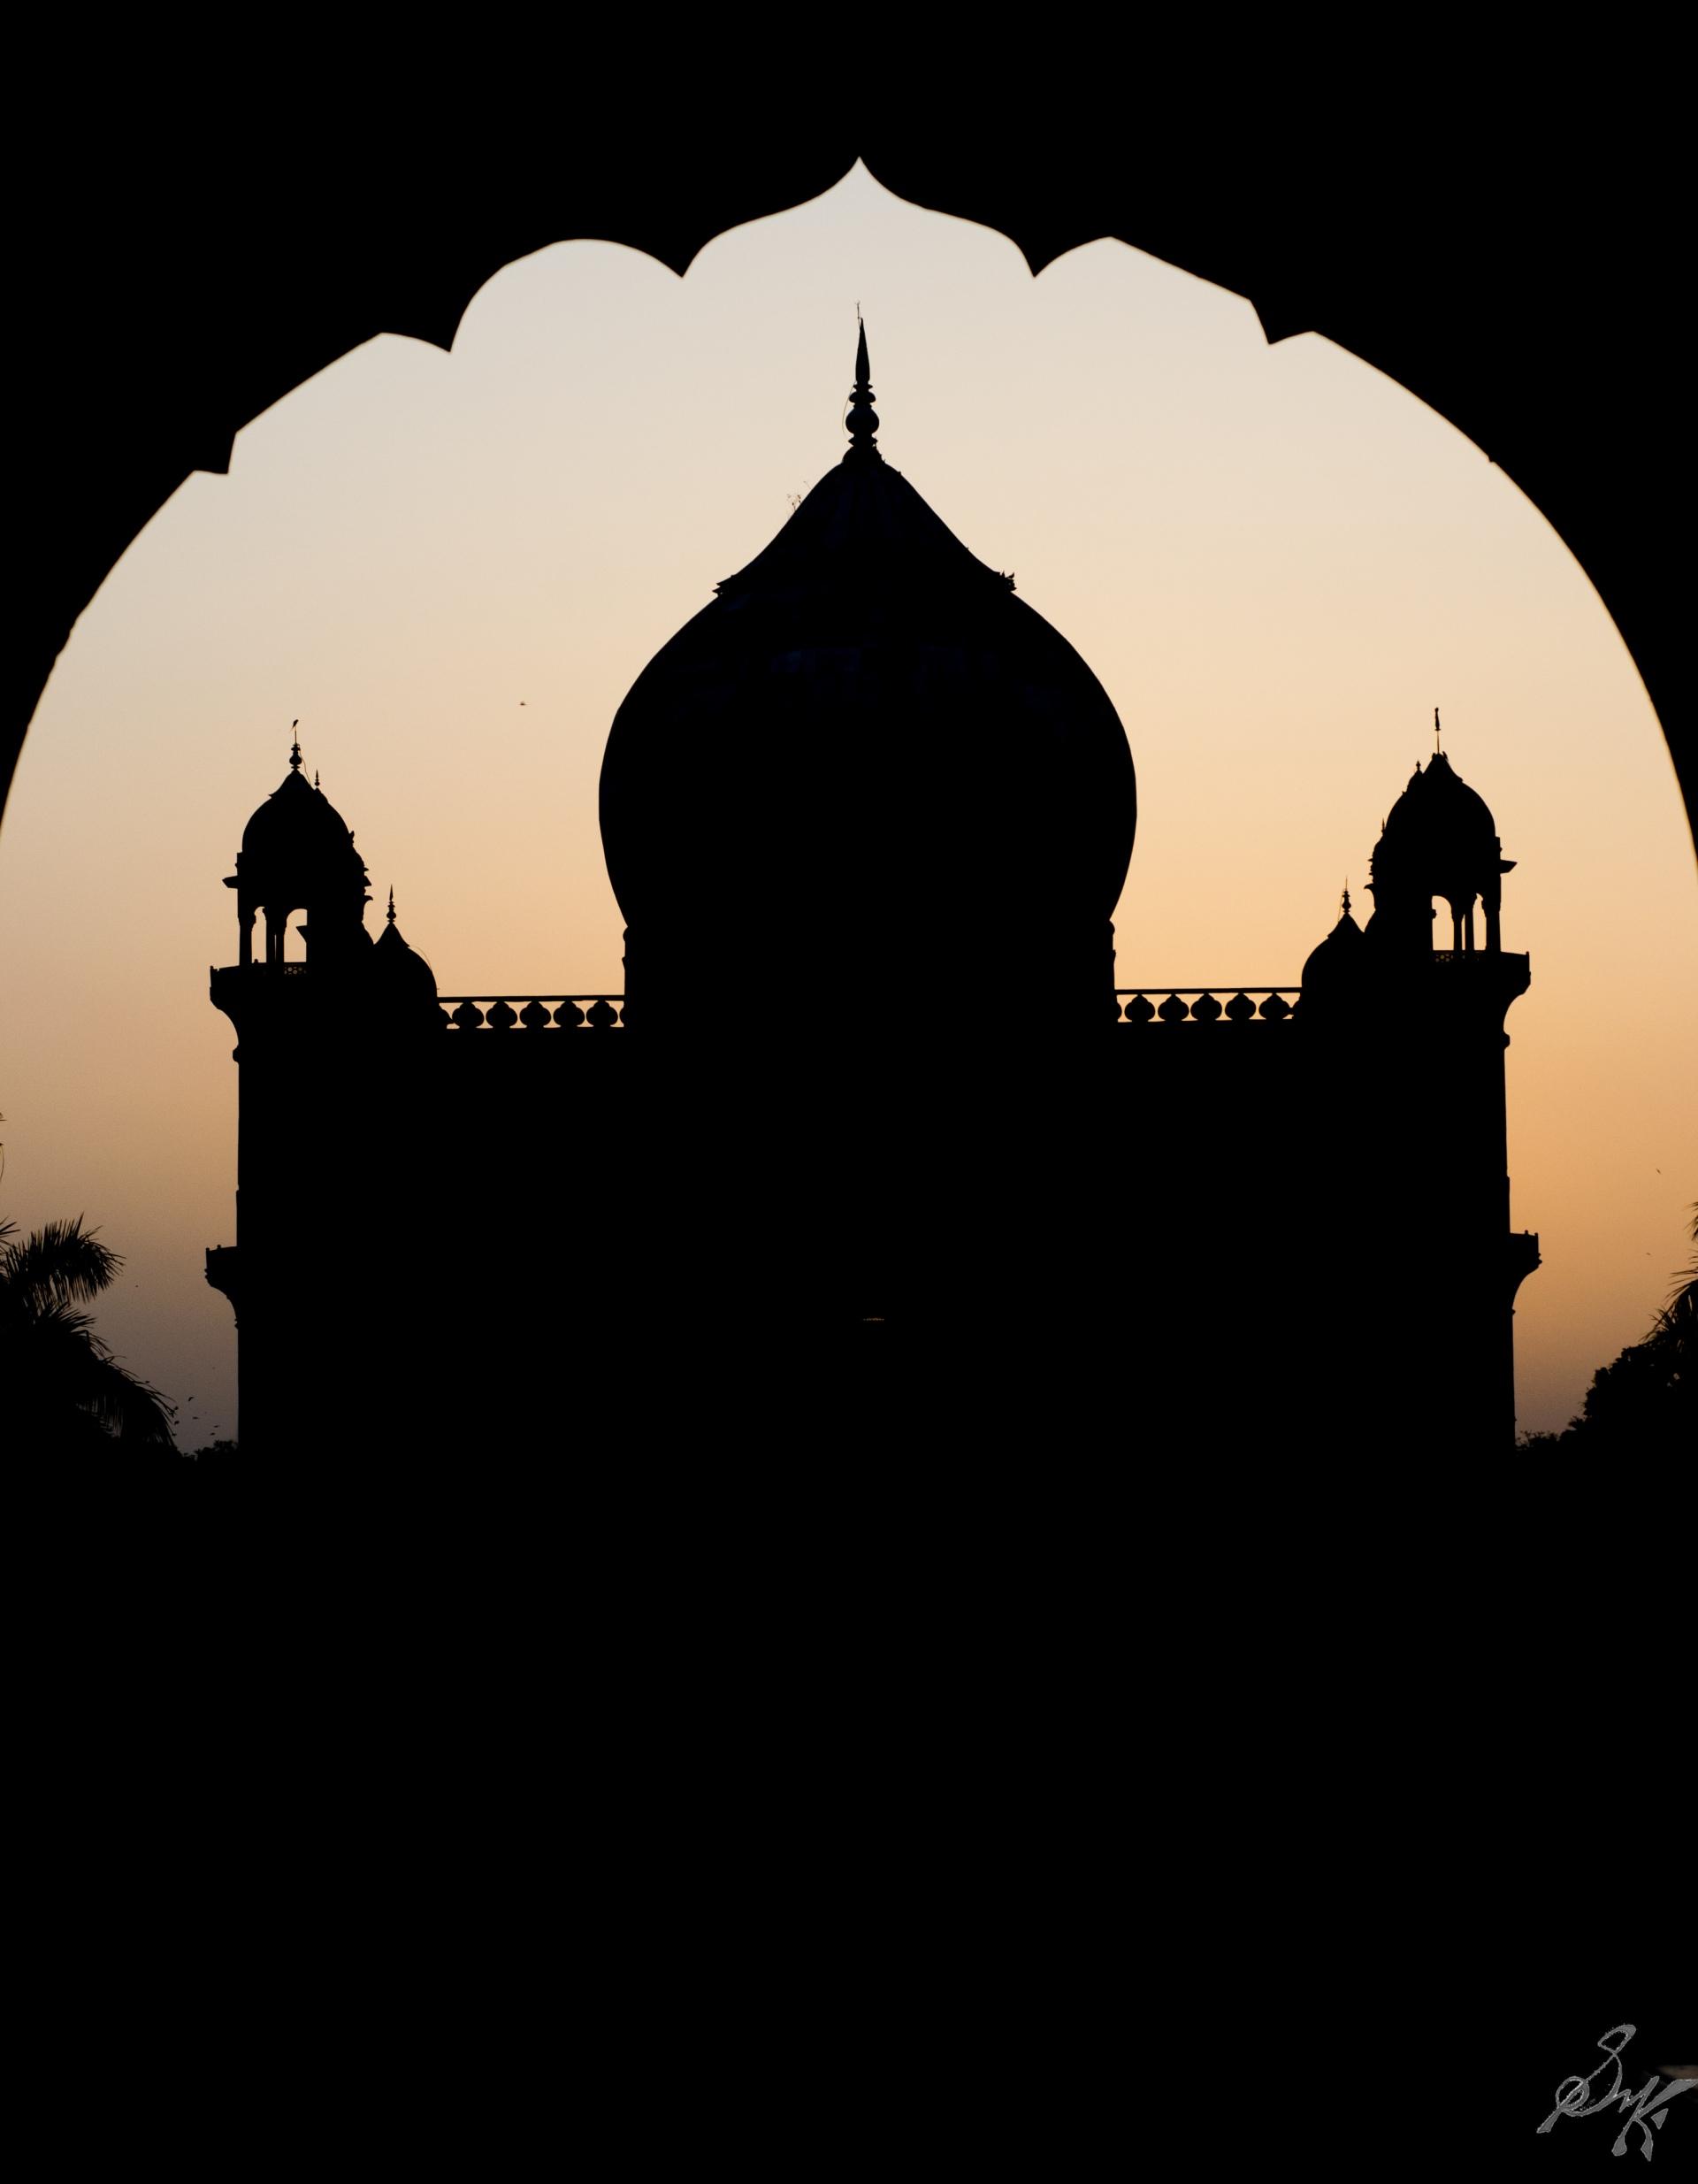 Safdarjung's Tomb in silhouette, Delhi, India